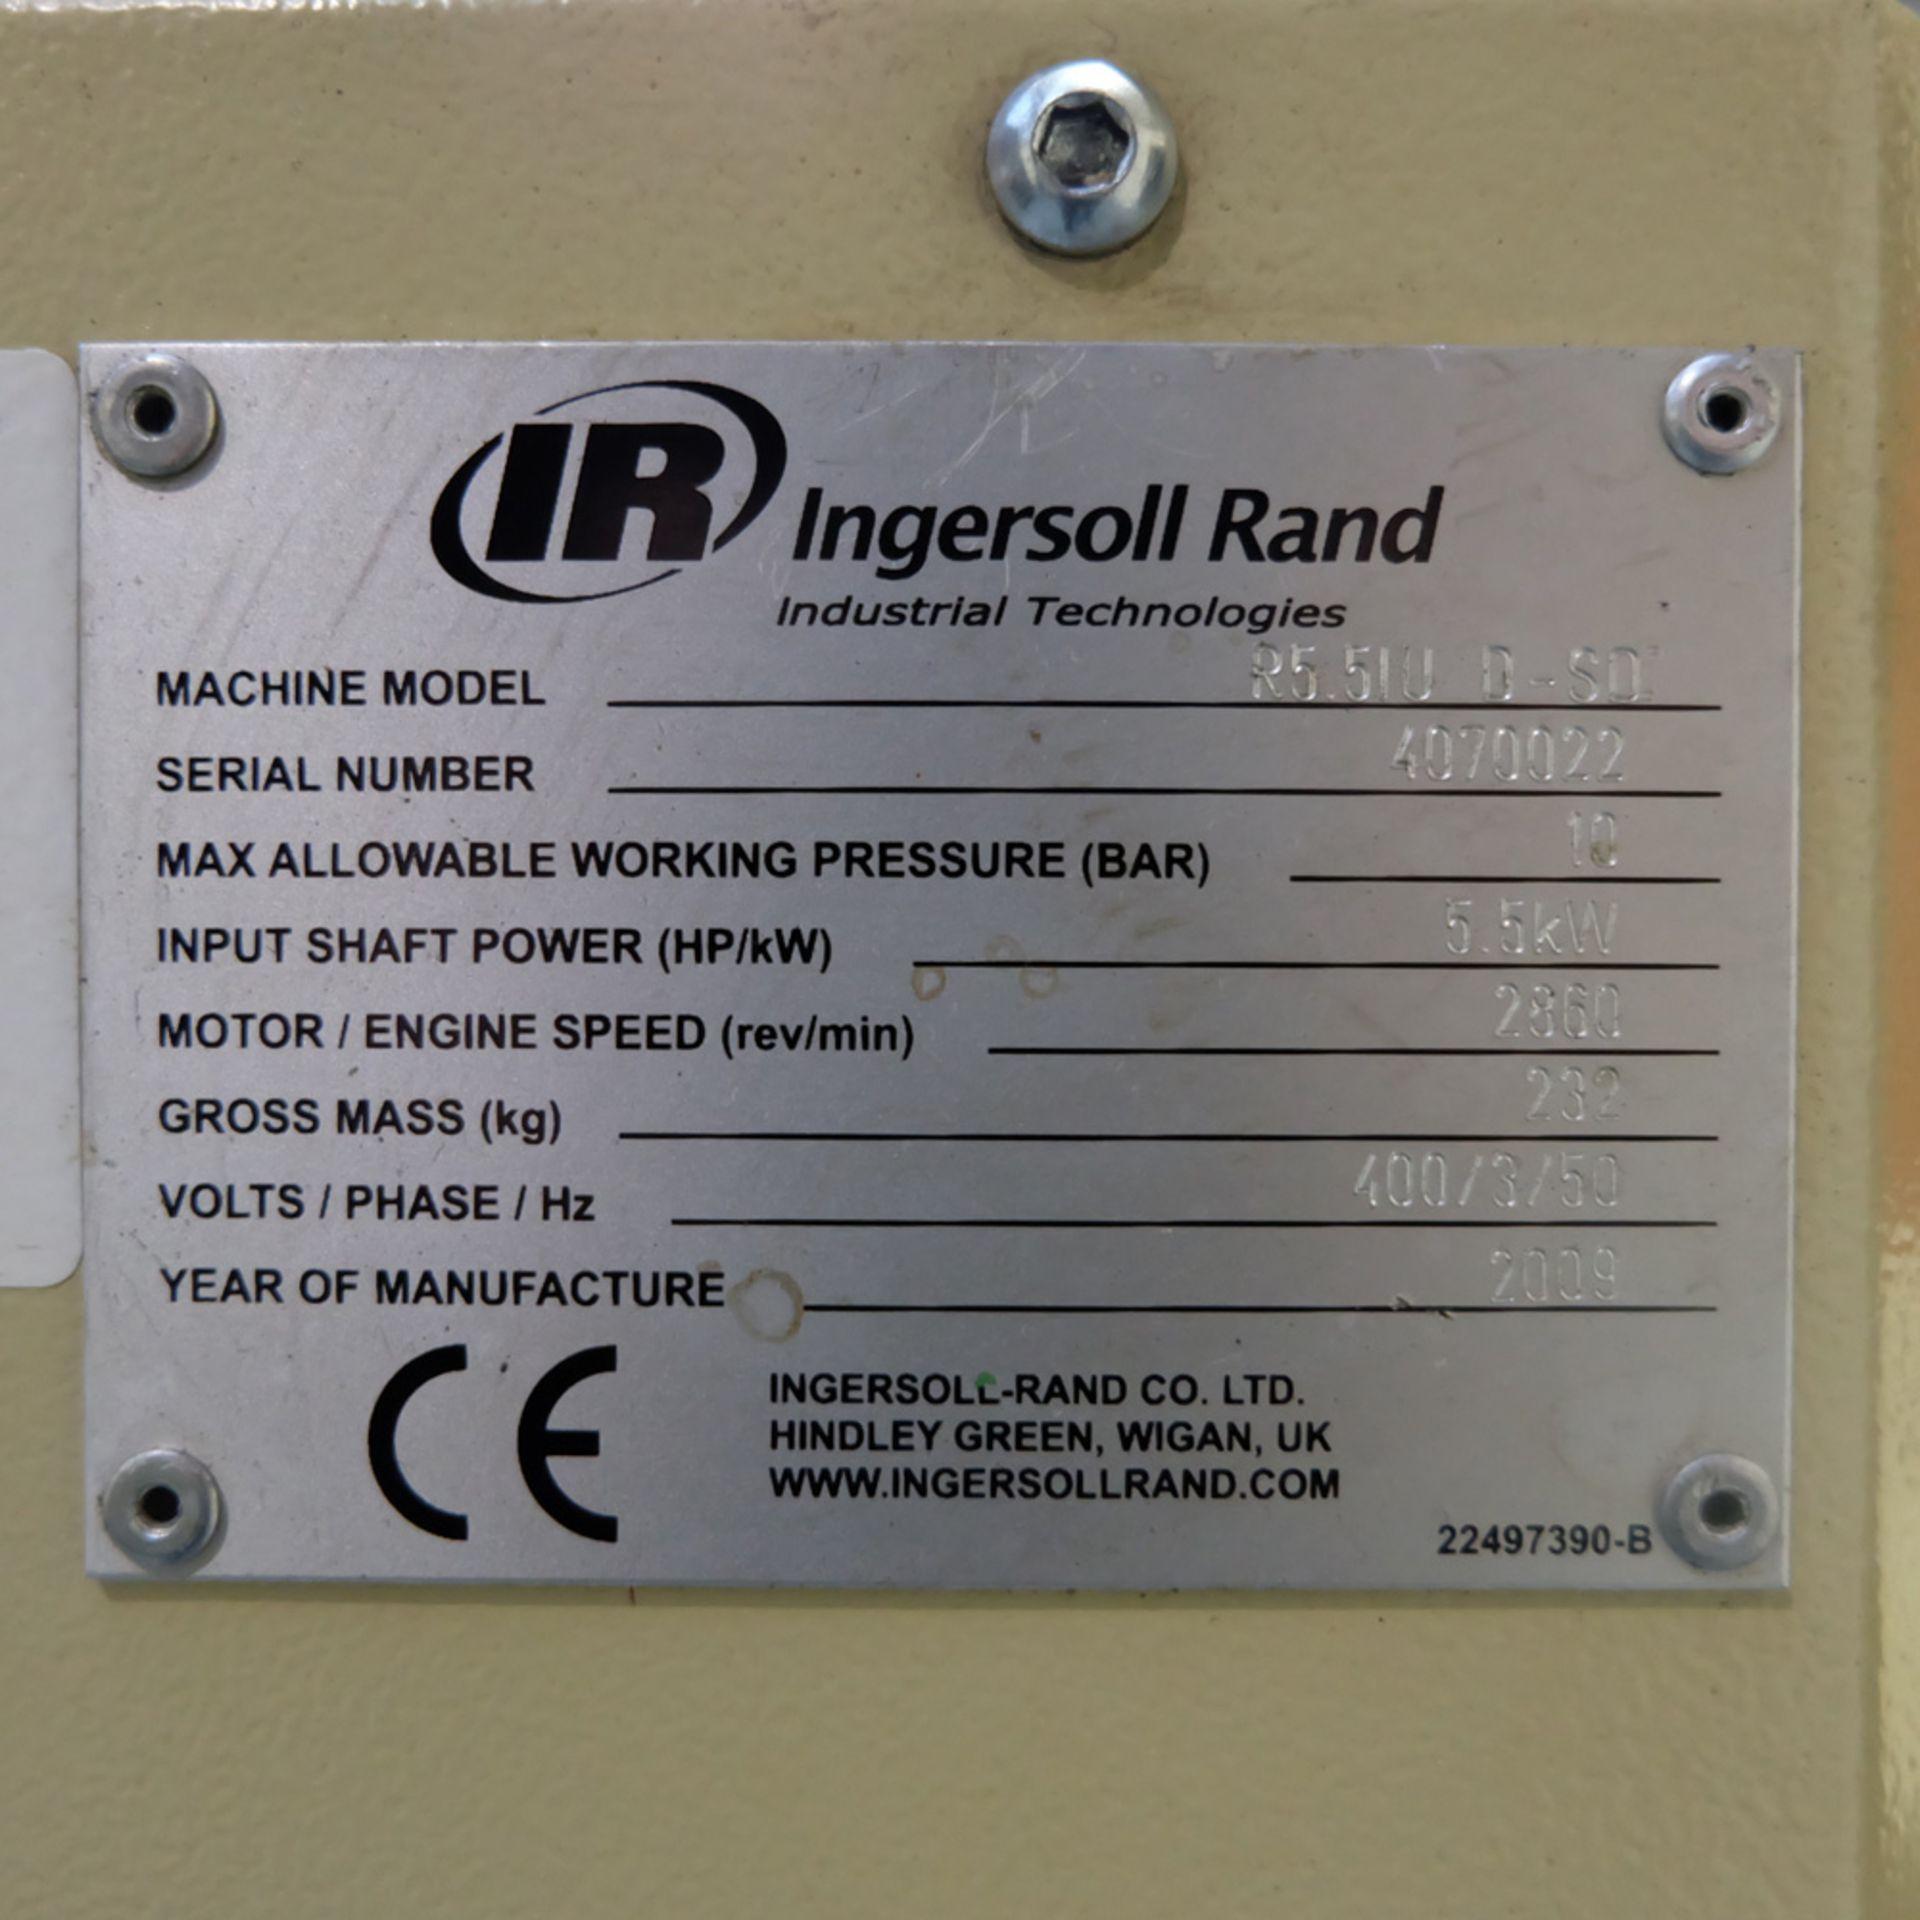 Ingersoll Rand Model R5.5IU D-SD Rotary Air Compressor. Working Pressure 10 Bar. - Image 7 of 9